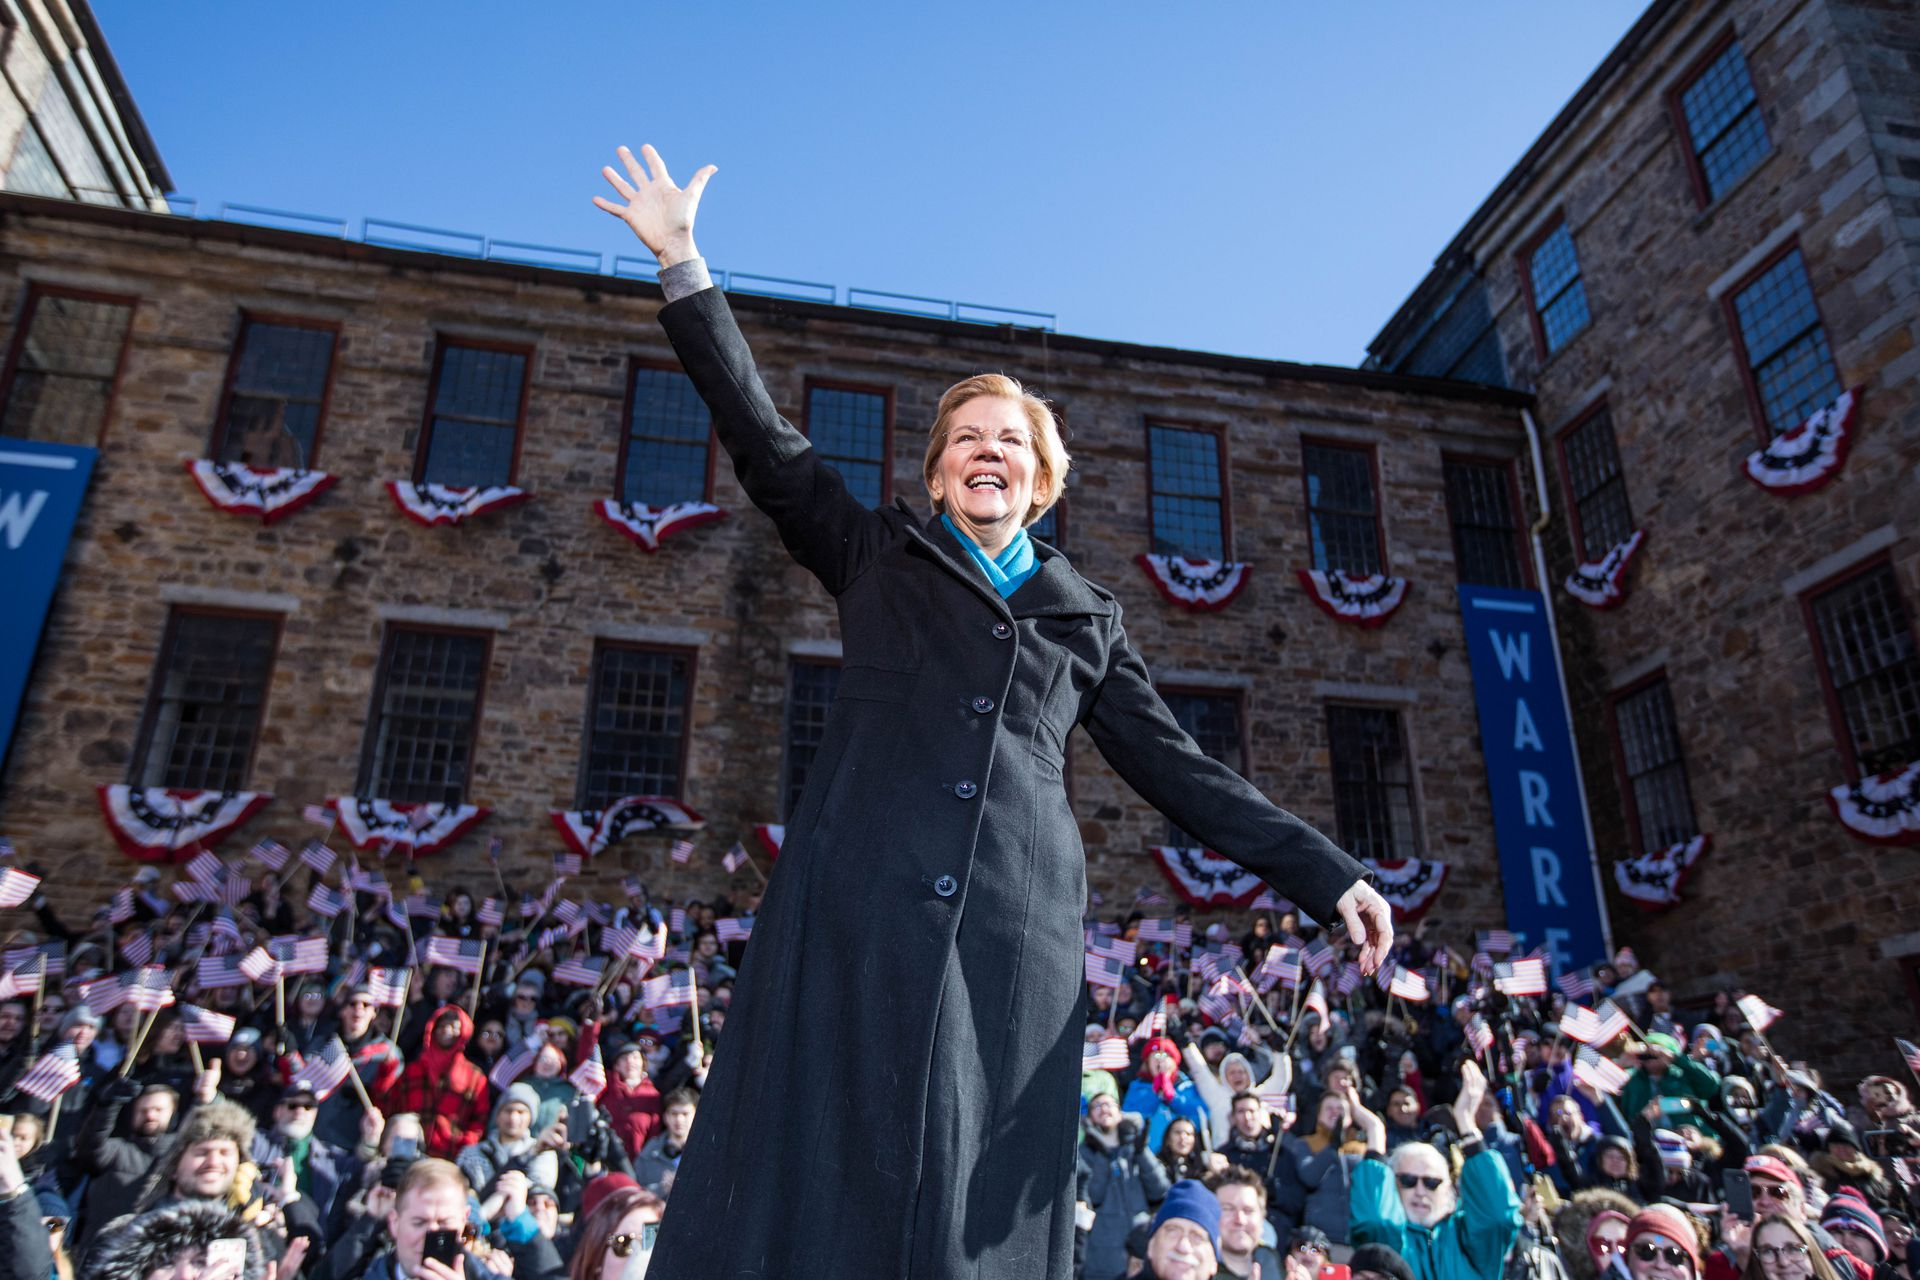 Elizabeth Warren on the issues, in under 500 words